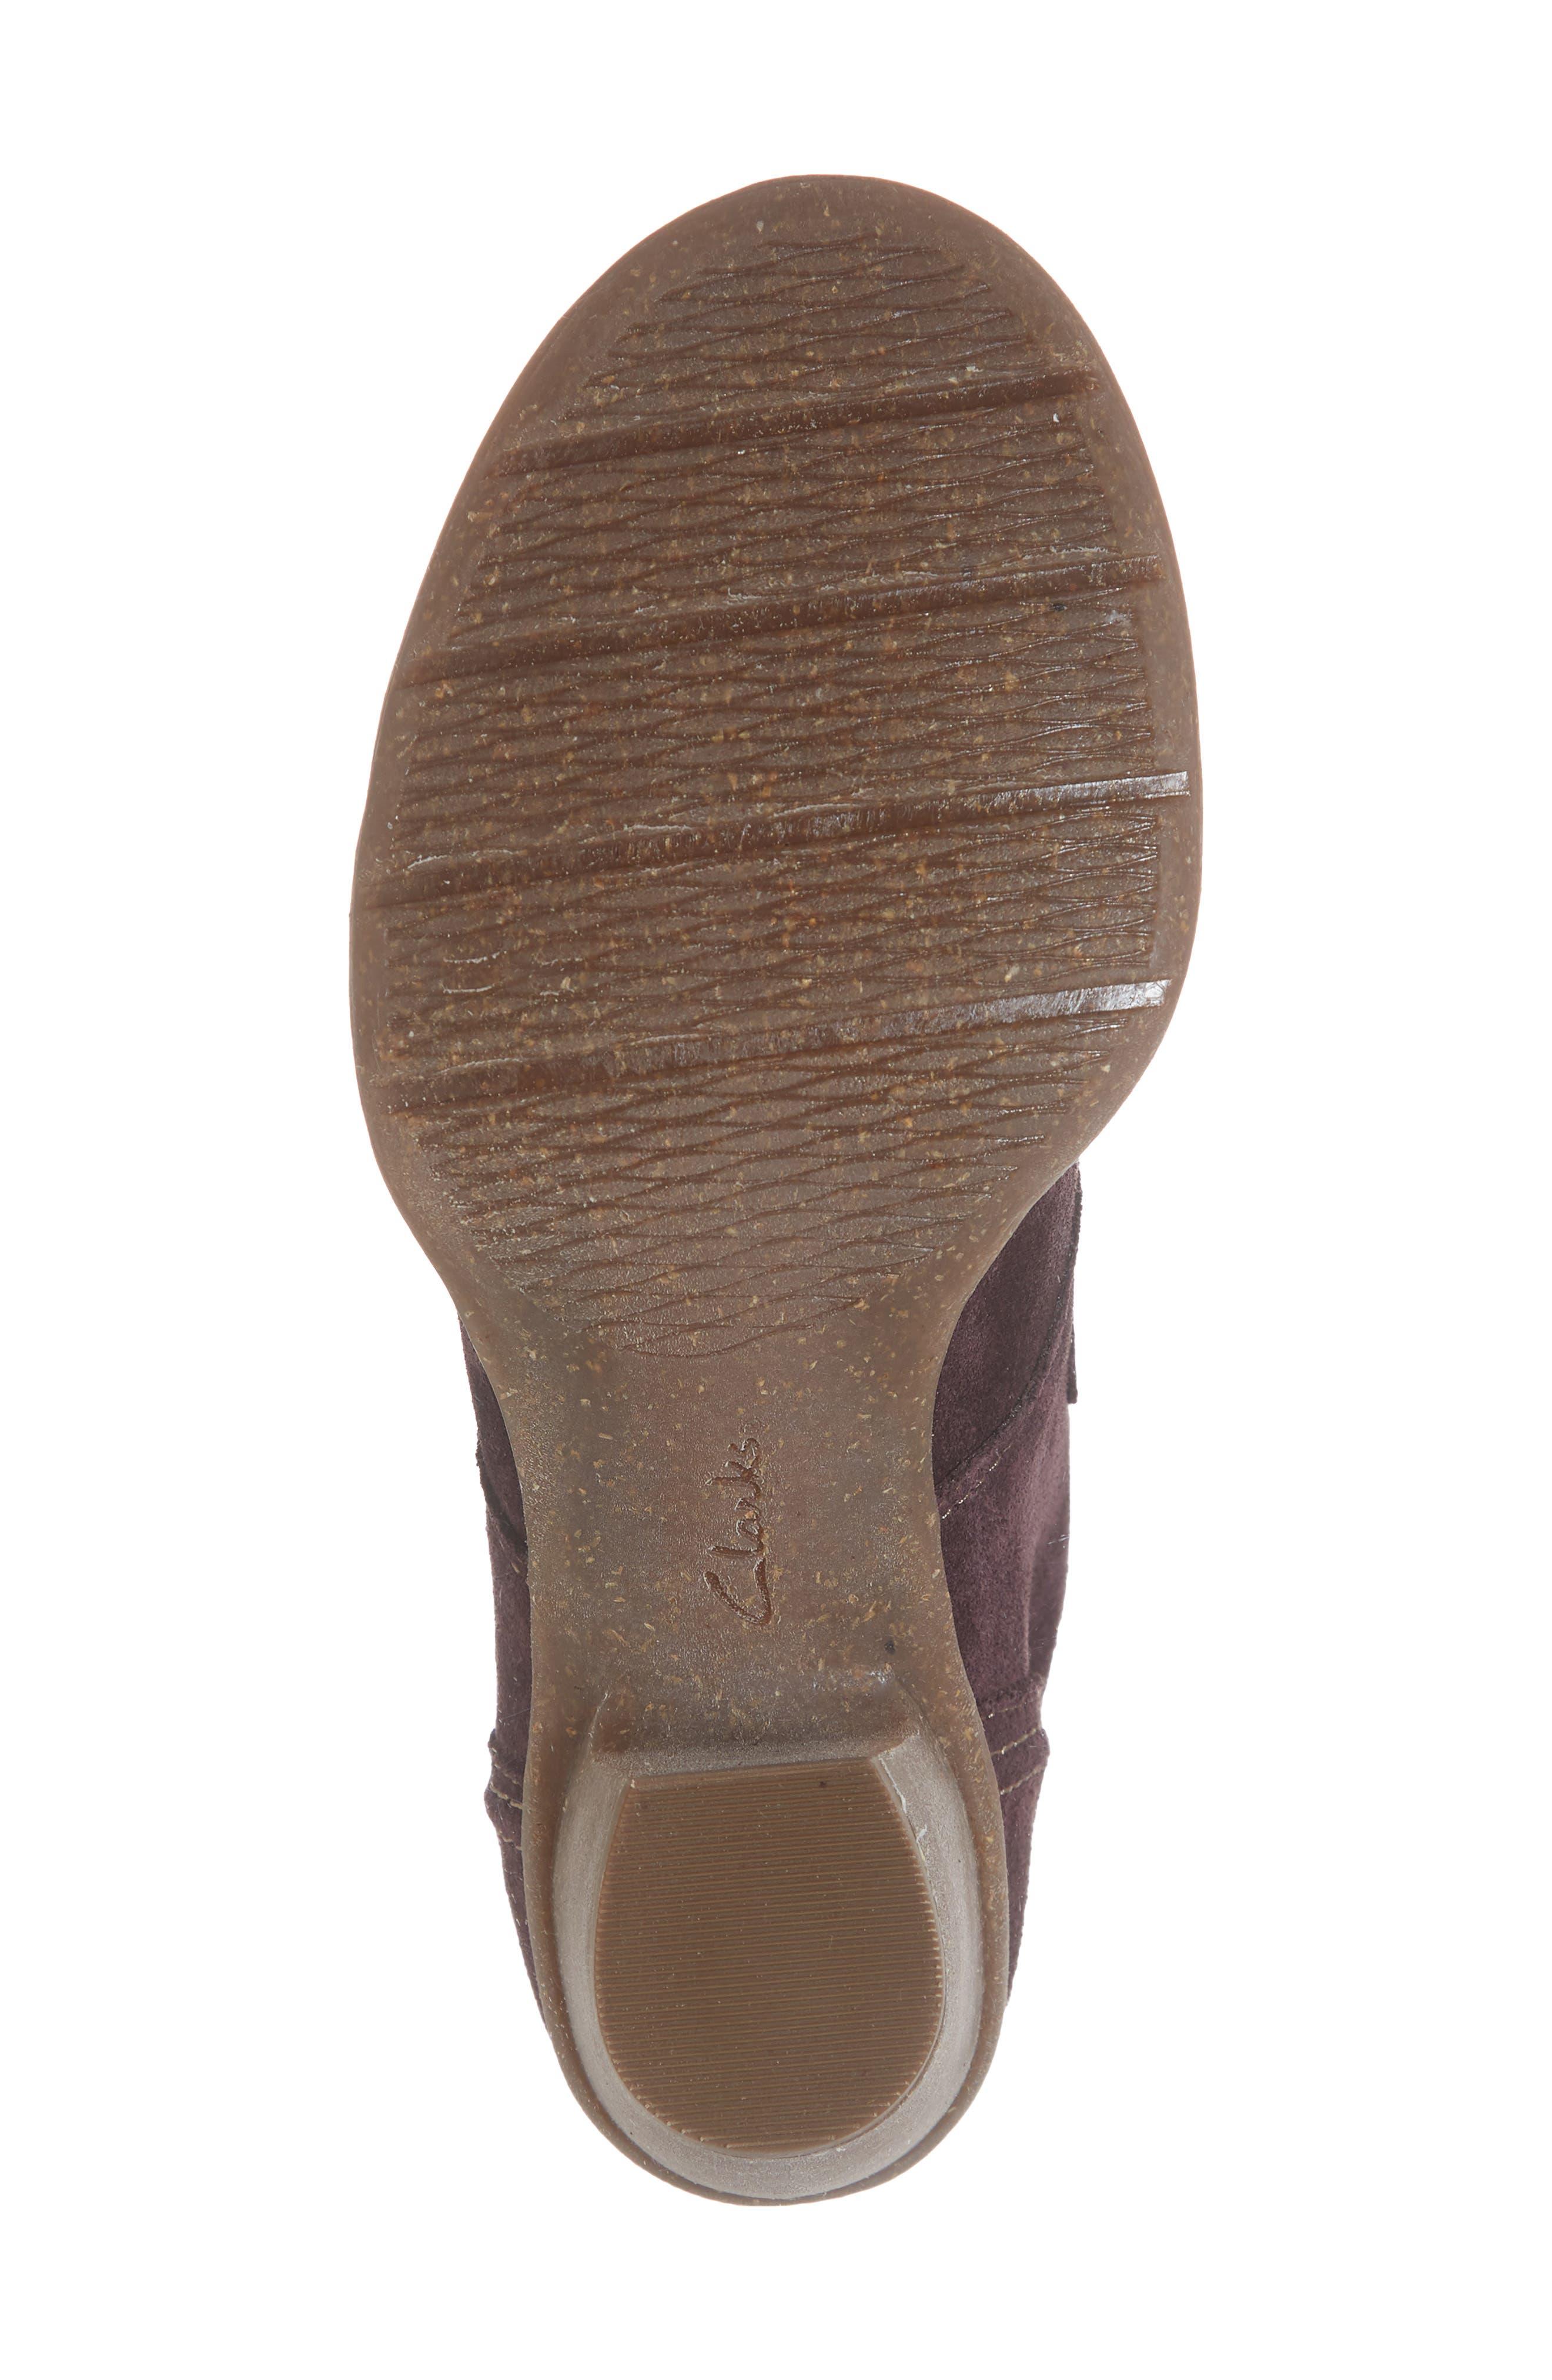 'Carleta Lyon' Ankle Boot,                             Alternate thumbnail 6, color,                             AUBERGINE SUEDE